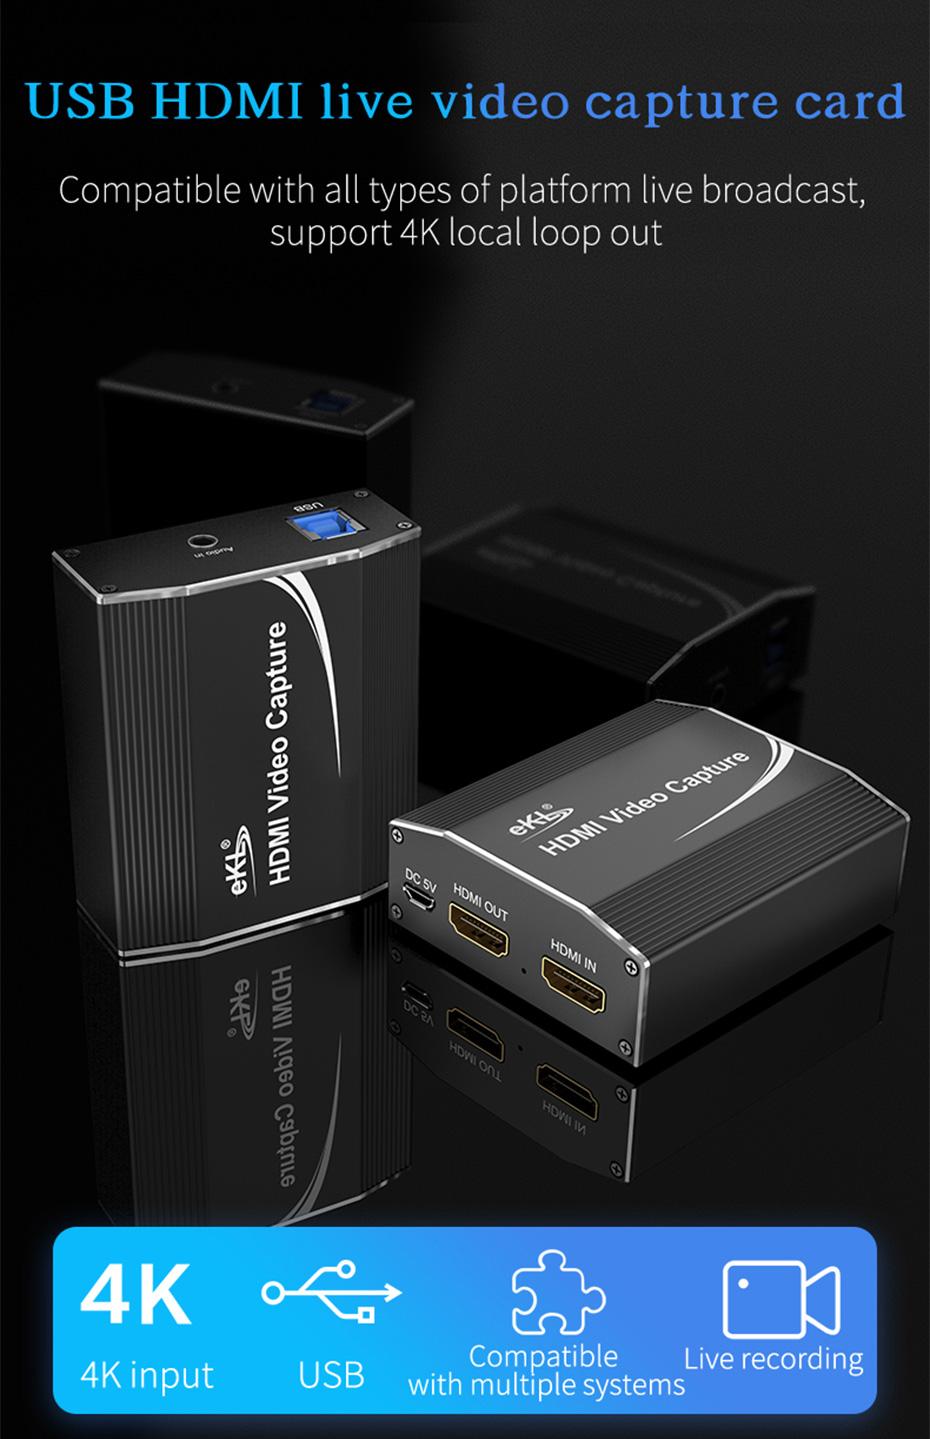 HDMI video live capture card 1805